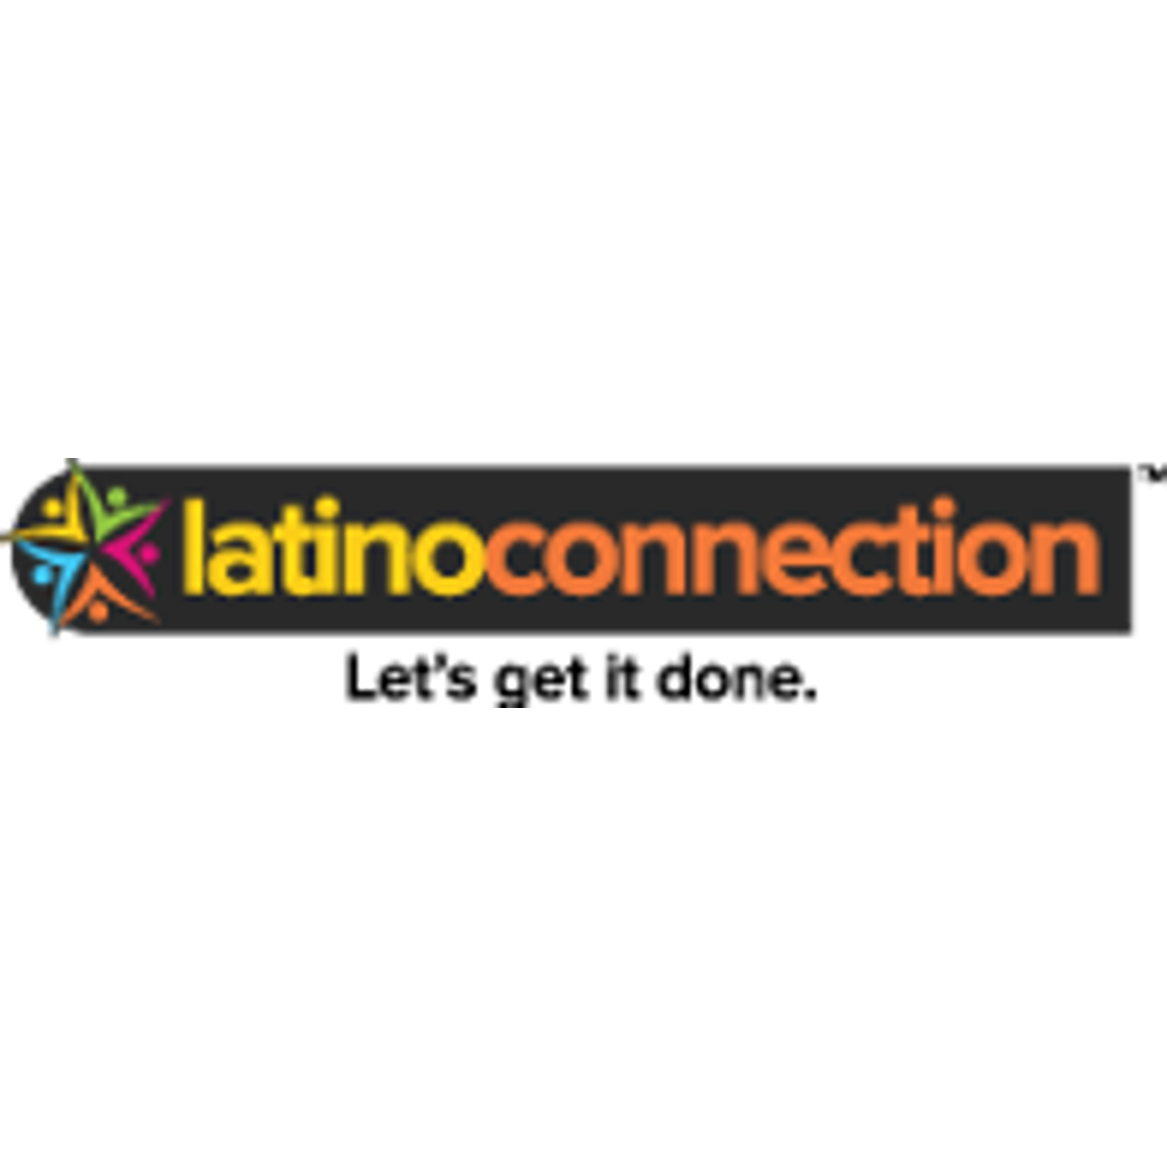 Latino Connection